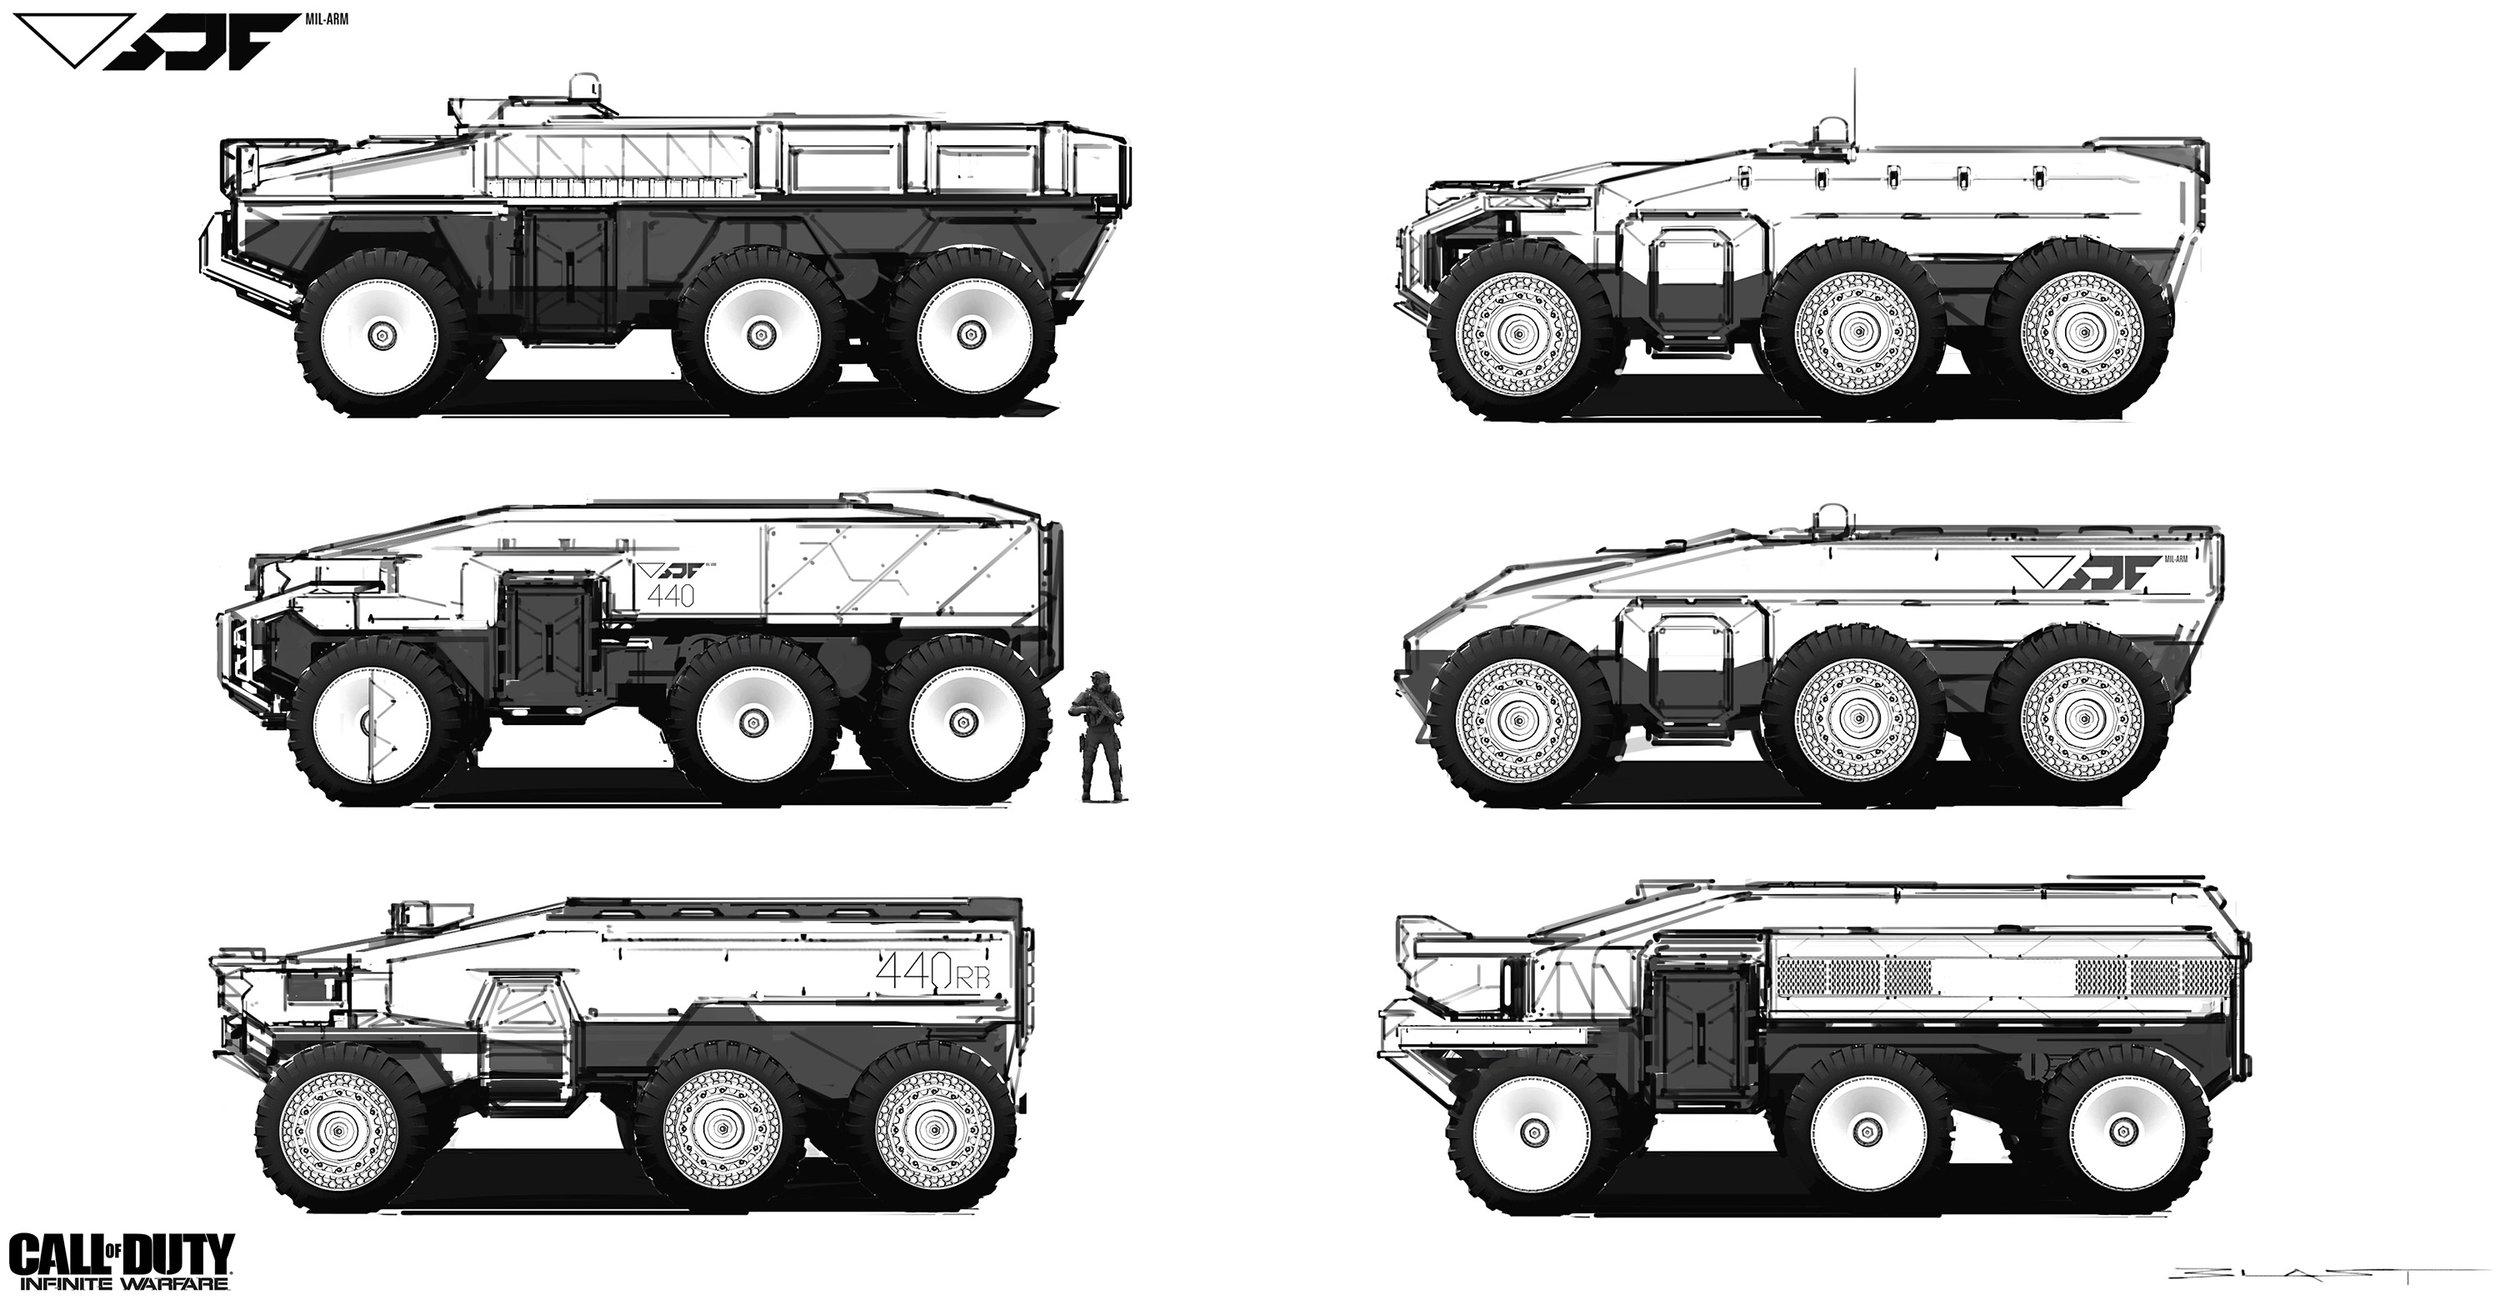 callofduty_benjaminlast_apc_vehicledesign_concept_3